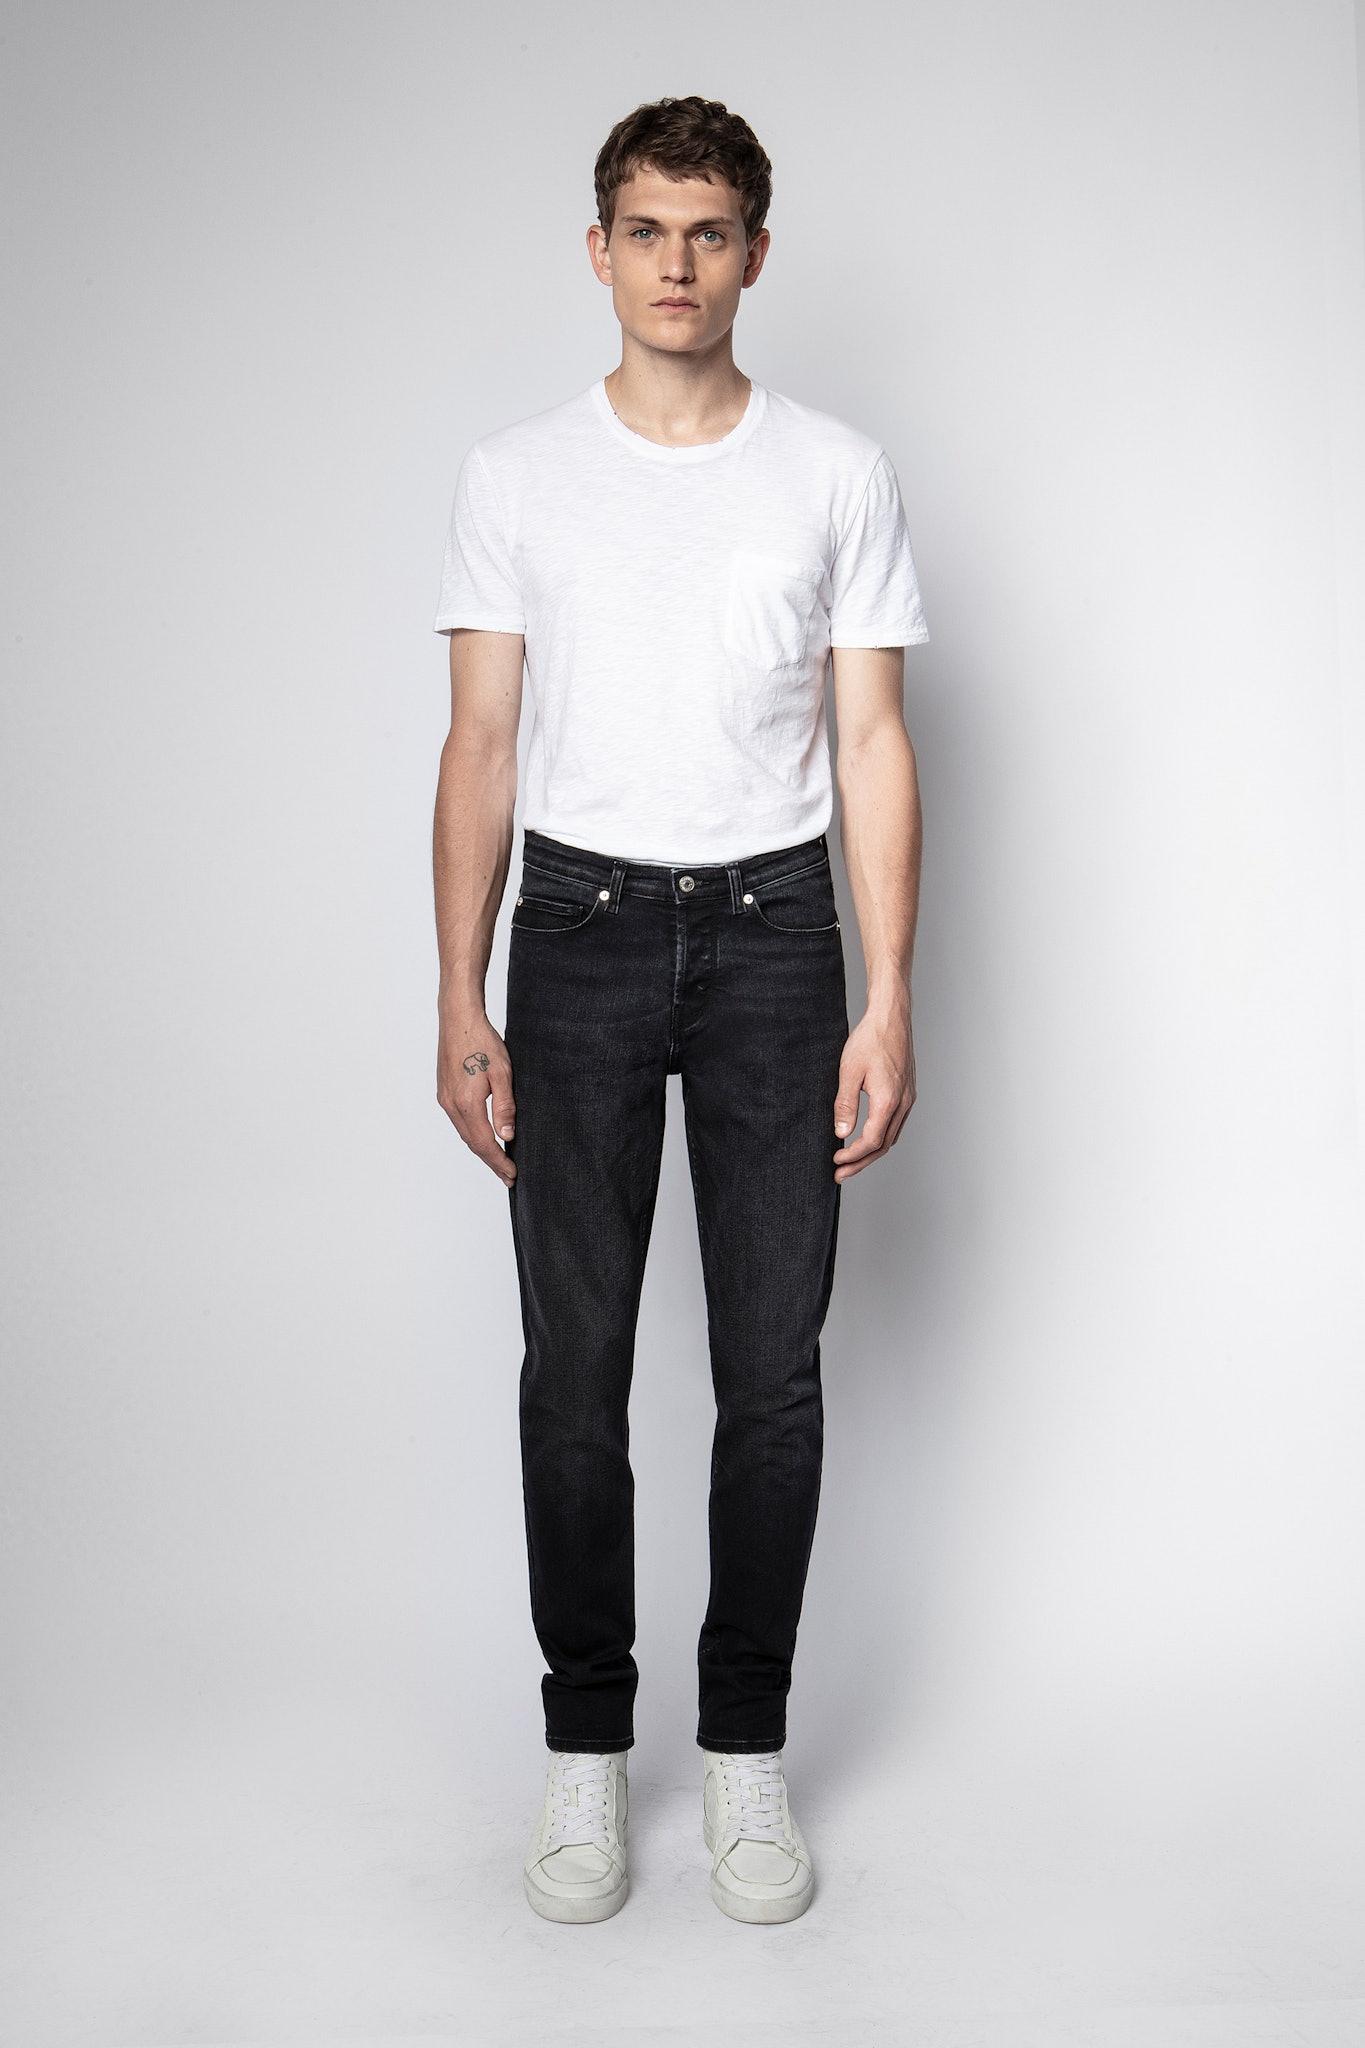 David Eco Jeans